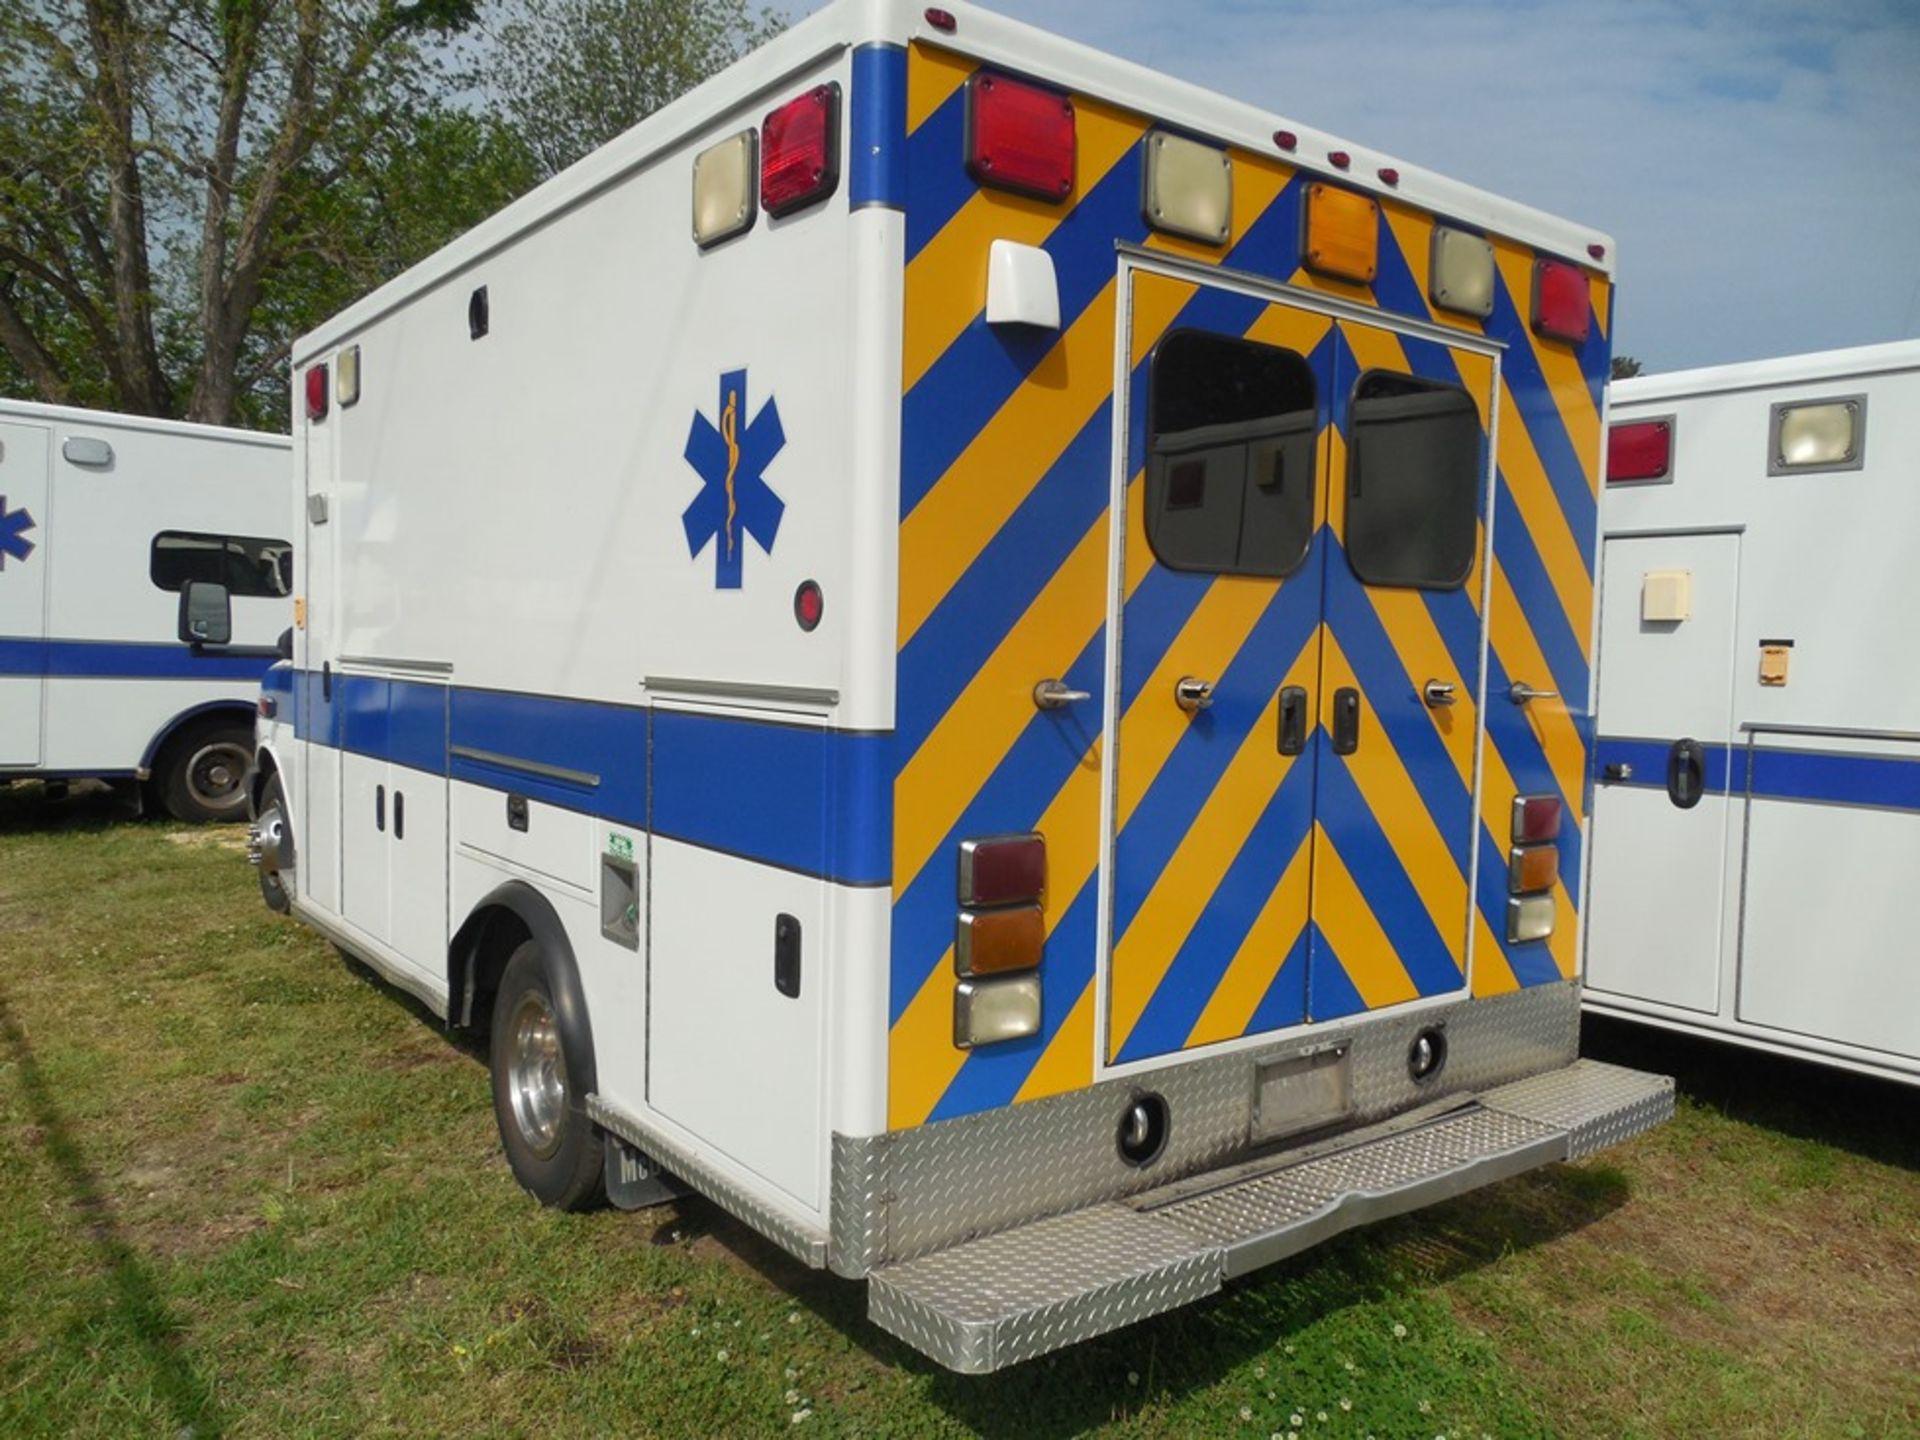 2010 Chev box van ambulance dsl, 250,597 miles, vin# 1GB9G5B65A1116120 - Image 5 of 6